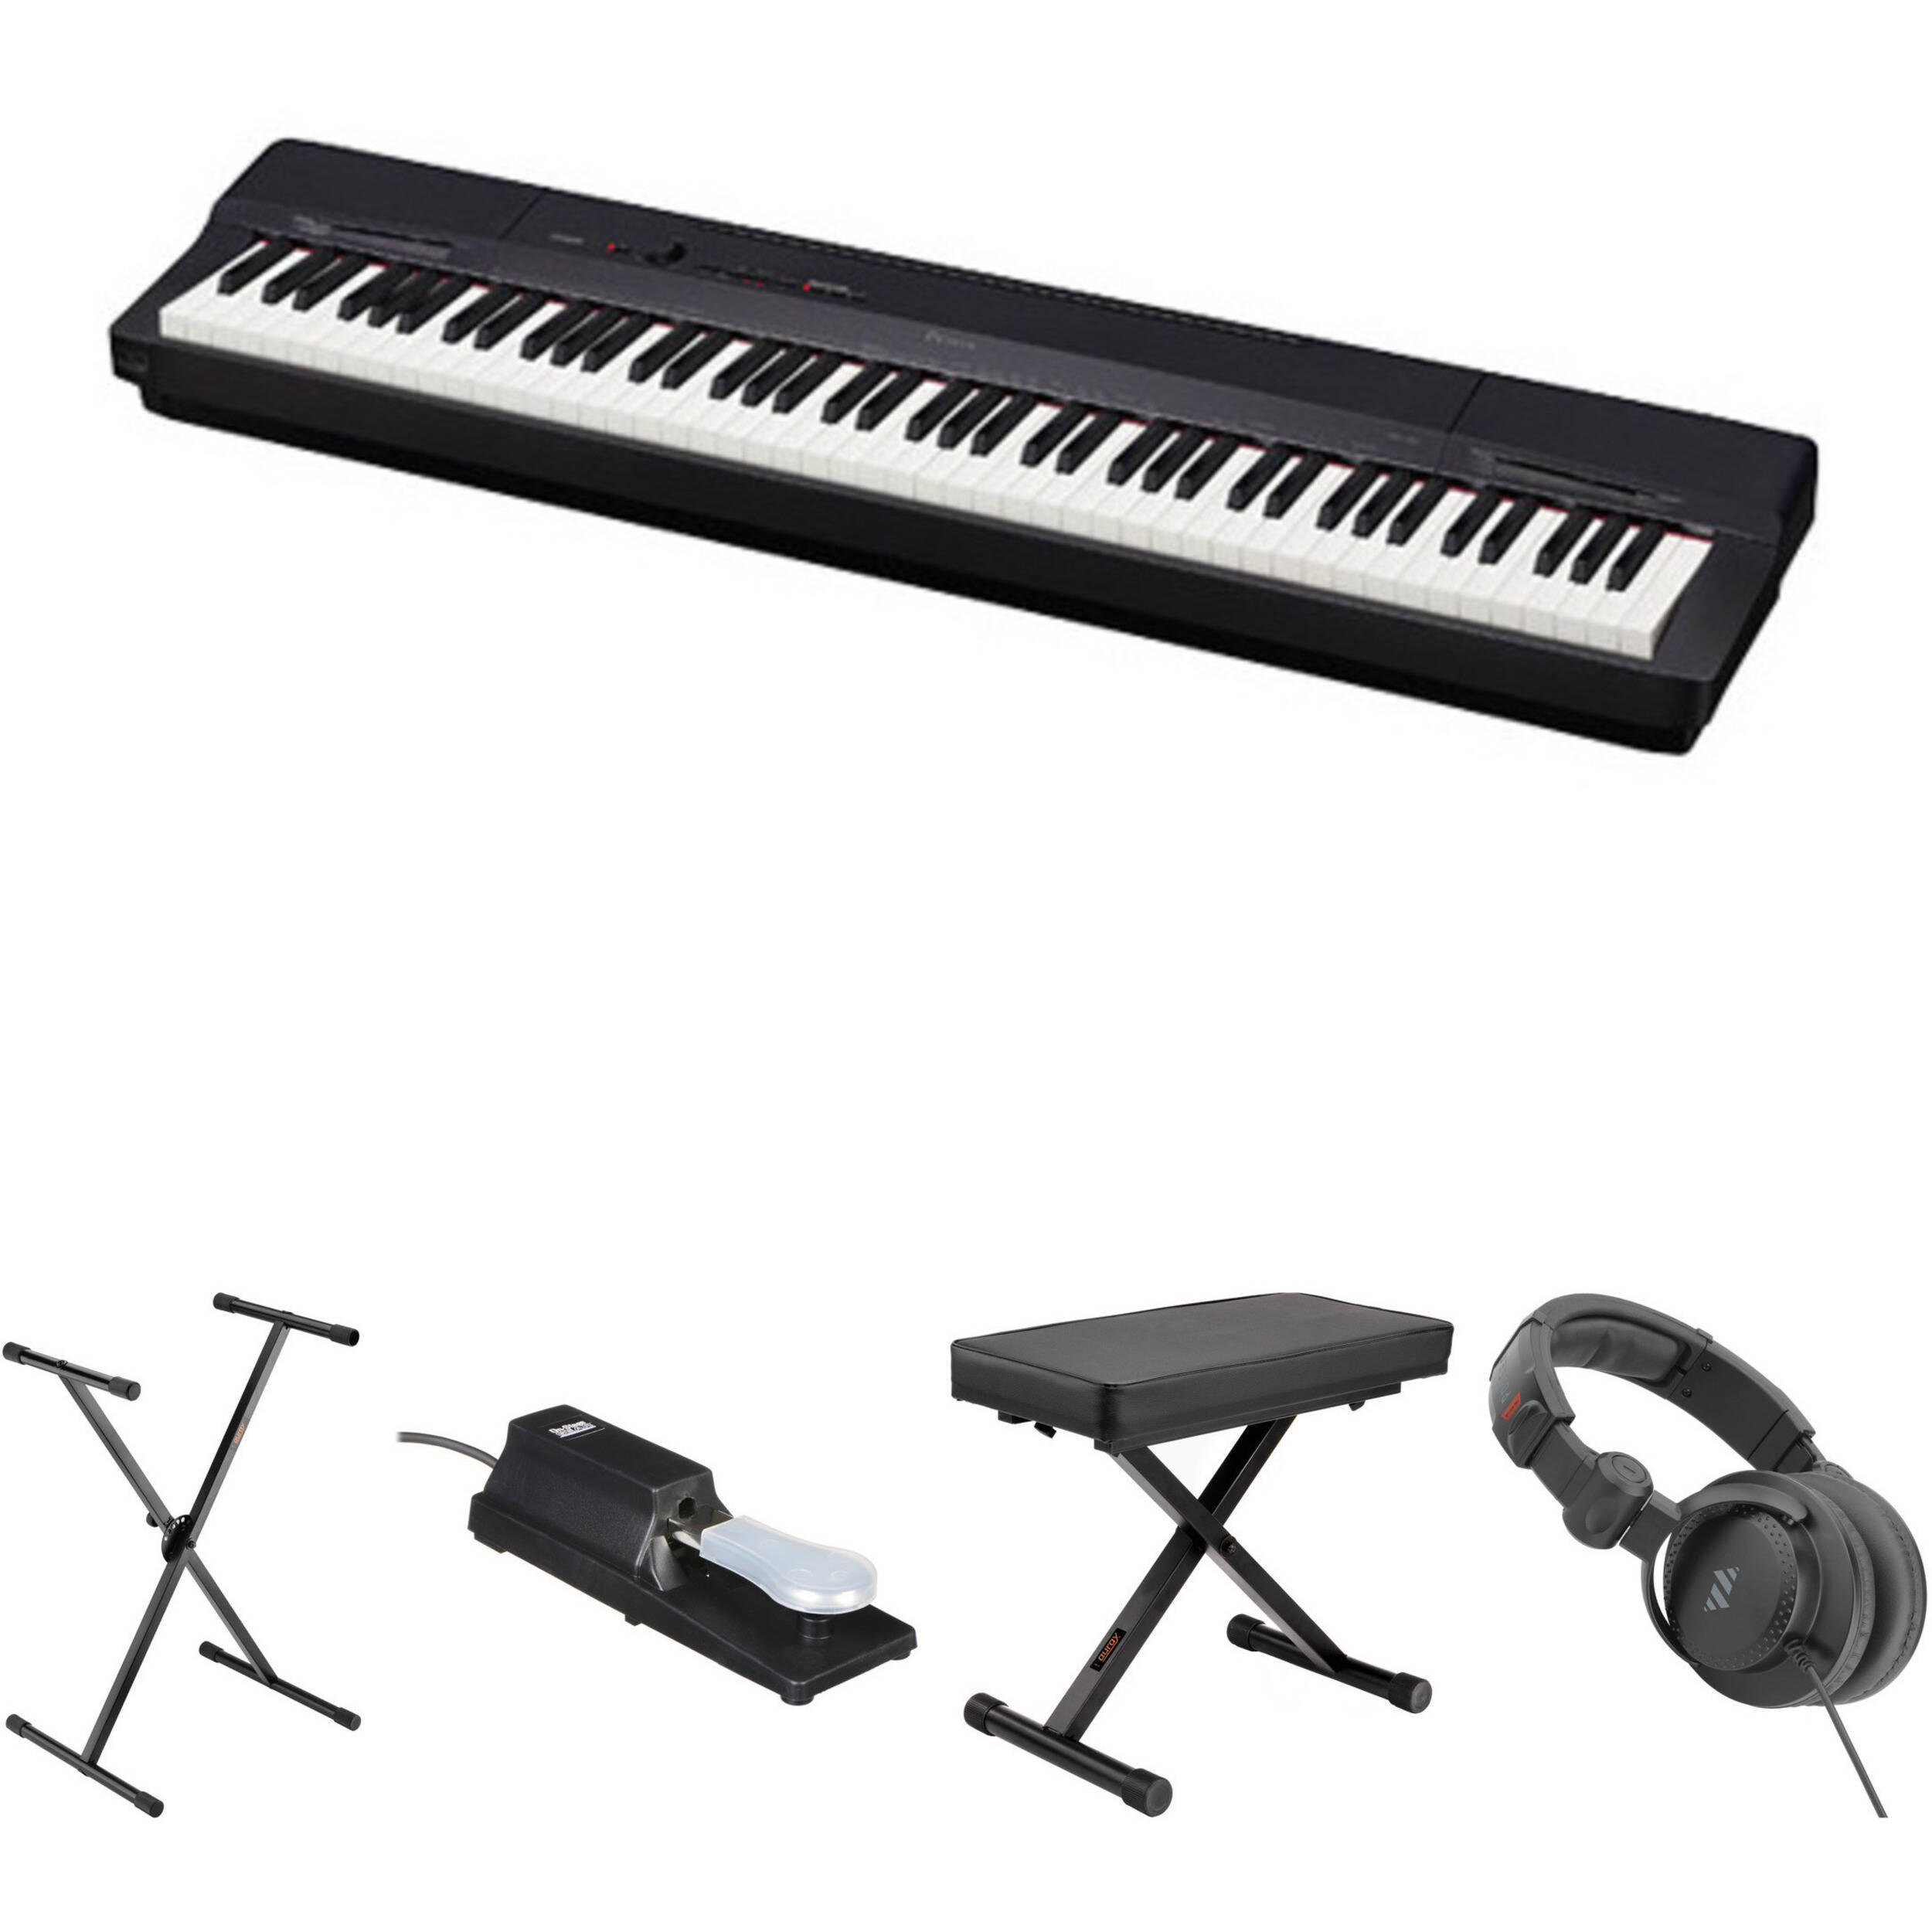 Piano Digital Casio Privia Px 160 : casio px 160 88 key digital piano essentials bundle black b h ~ Hamham.info Haus und Dekorationen